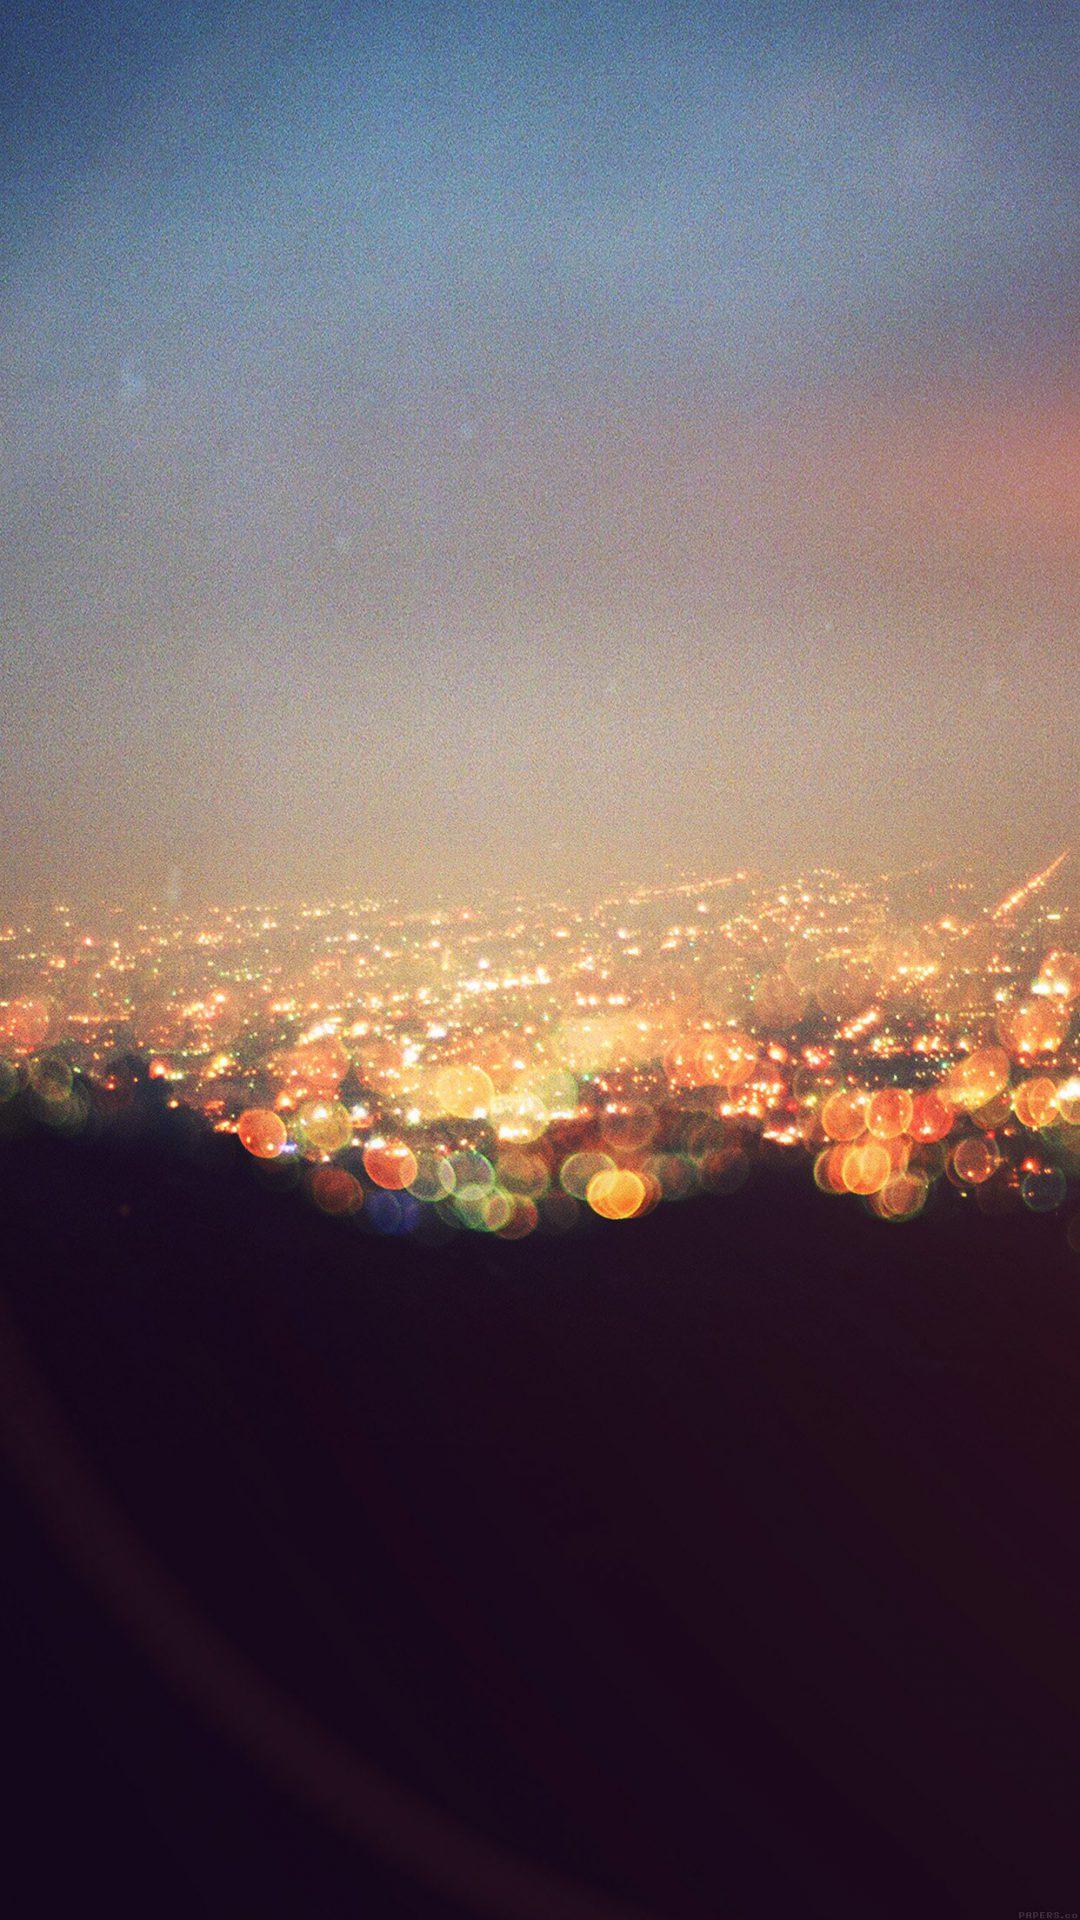 Bokeh Night City View Lights Flare